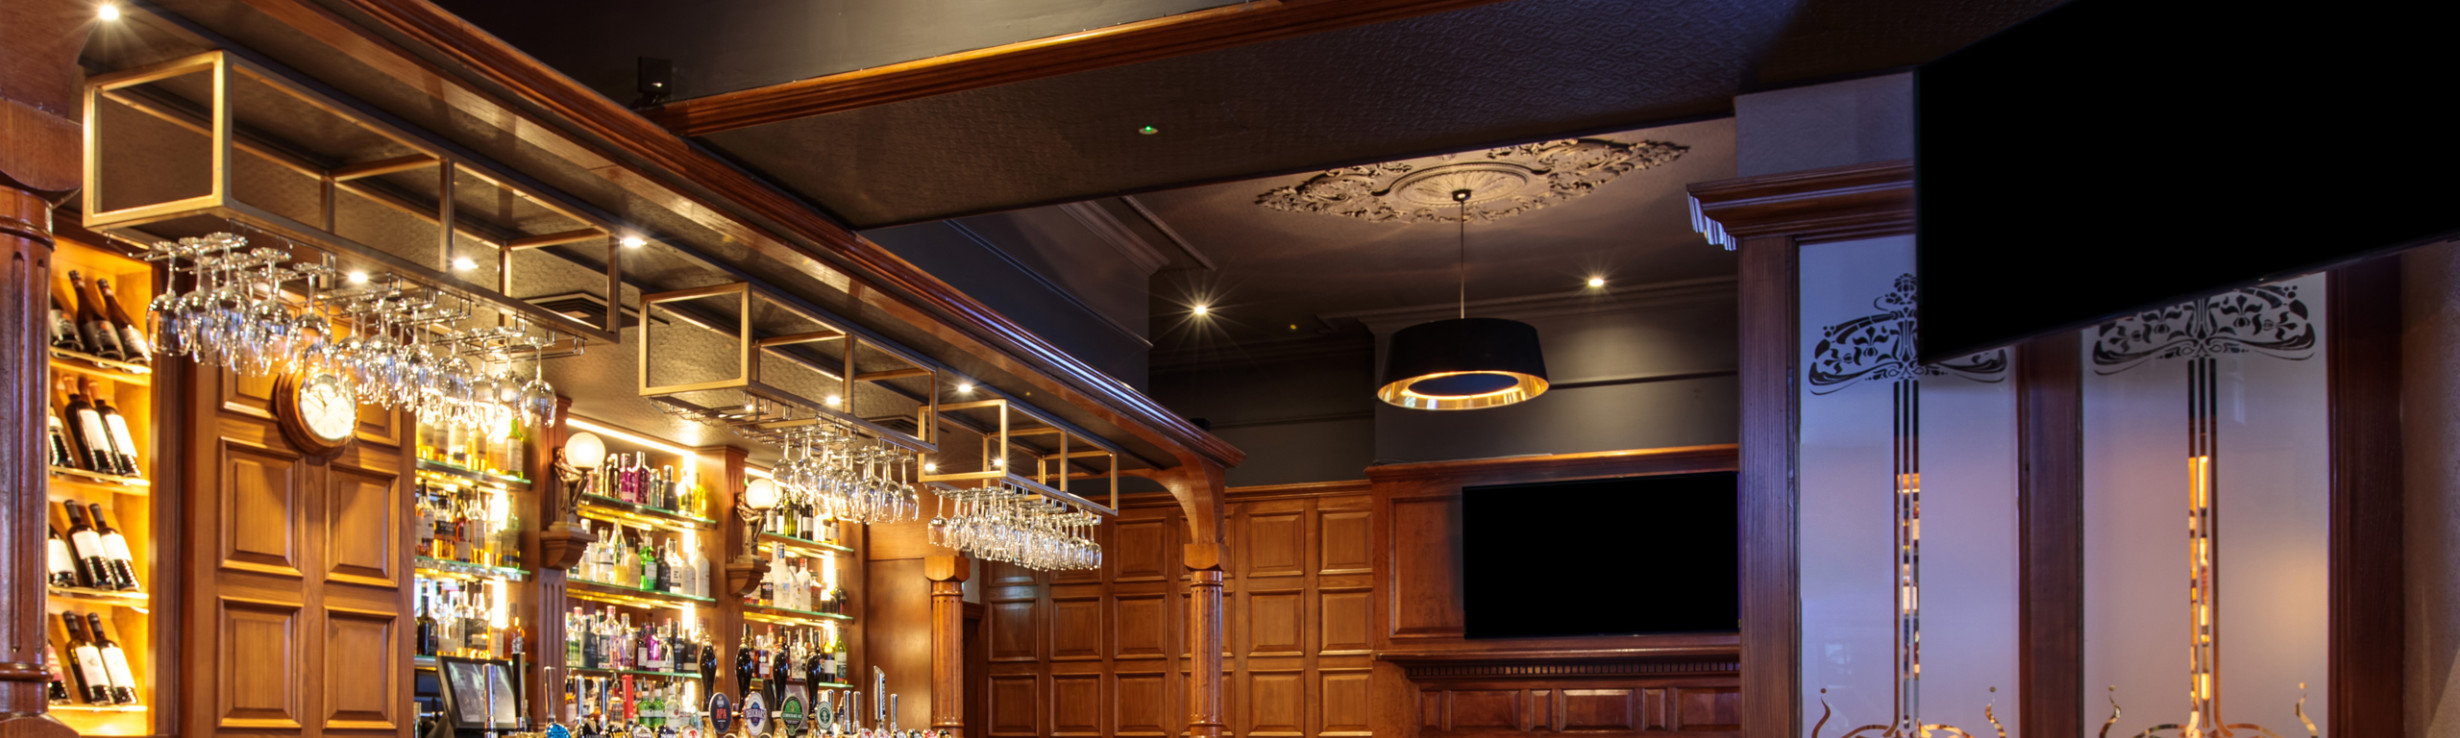 The Ferryhill - Bar & Restaurant Re-Opening